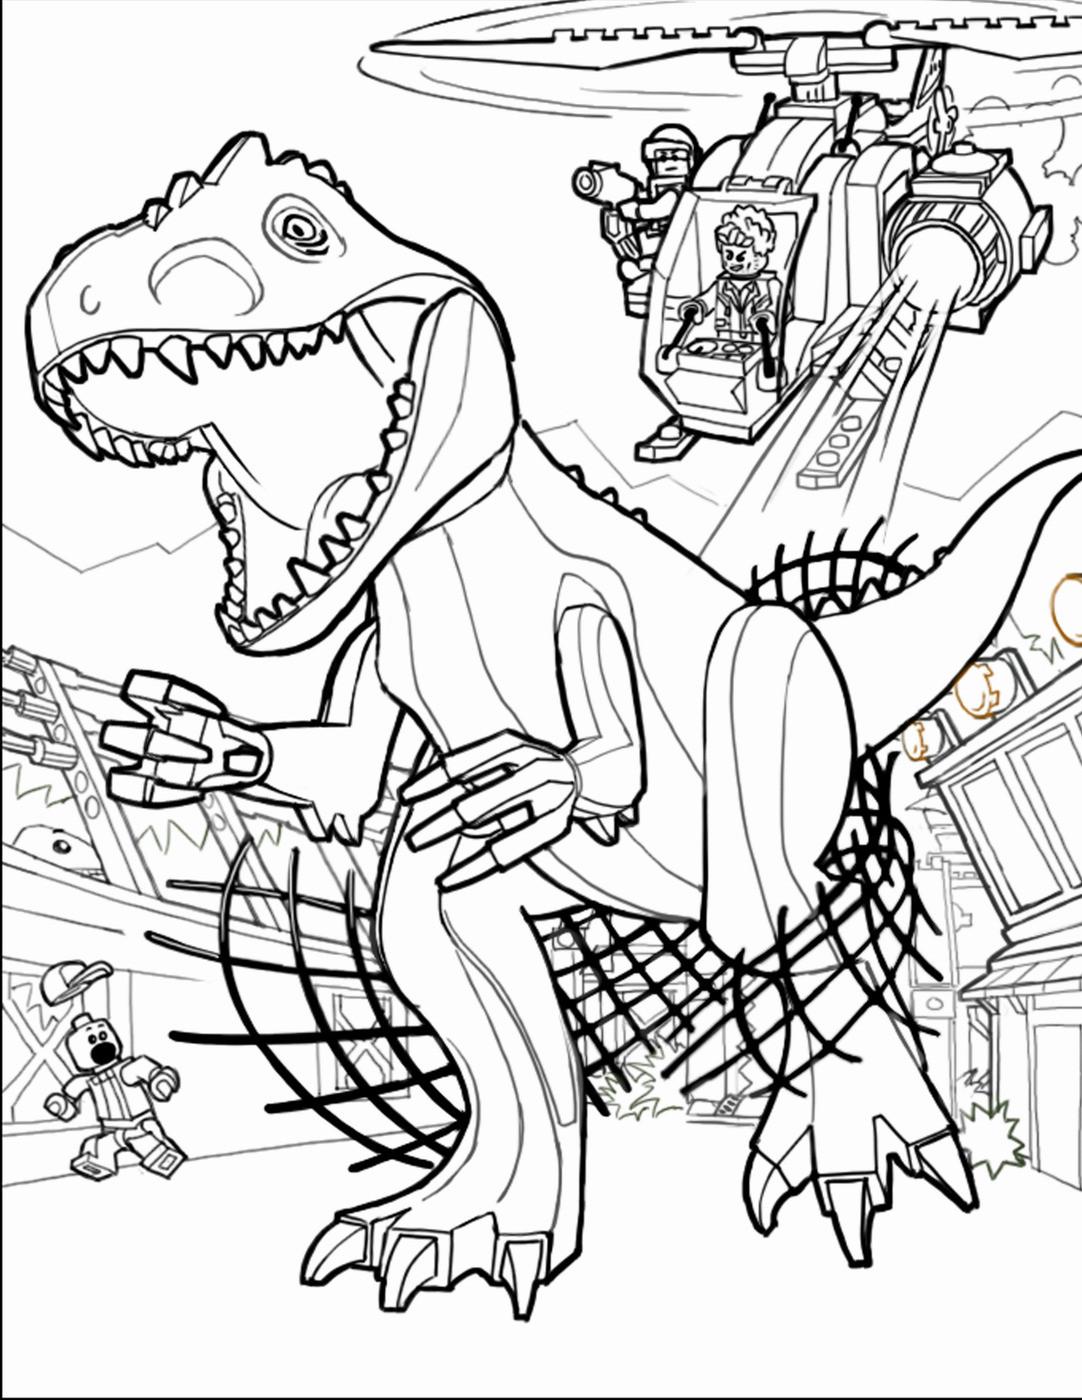 Jurassic World Ausmalbilder Neu Lego Coloring Pages Jurassic World Printables In 2018 Einzigartig Fotos